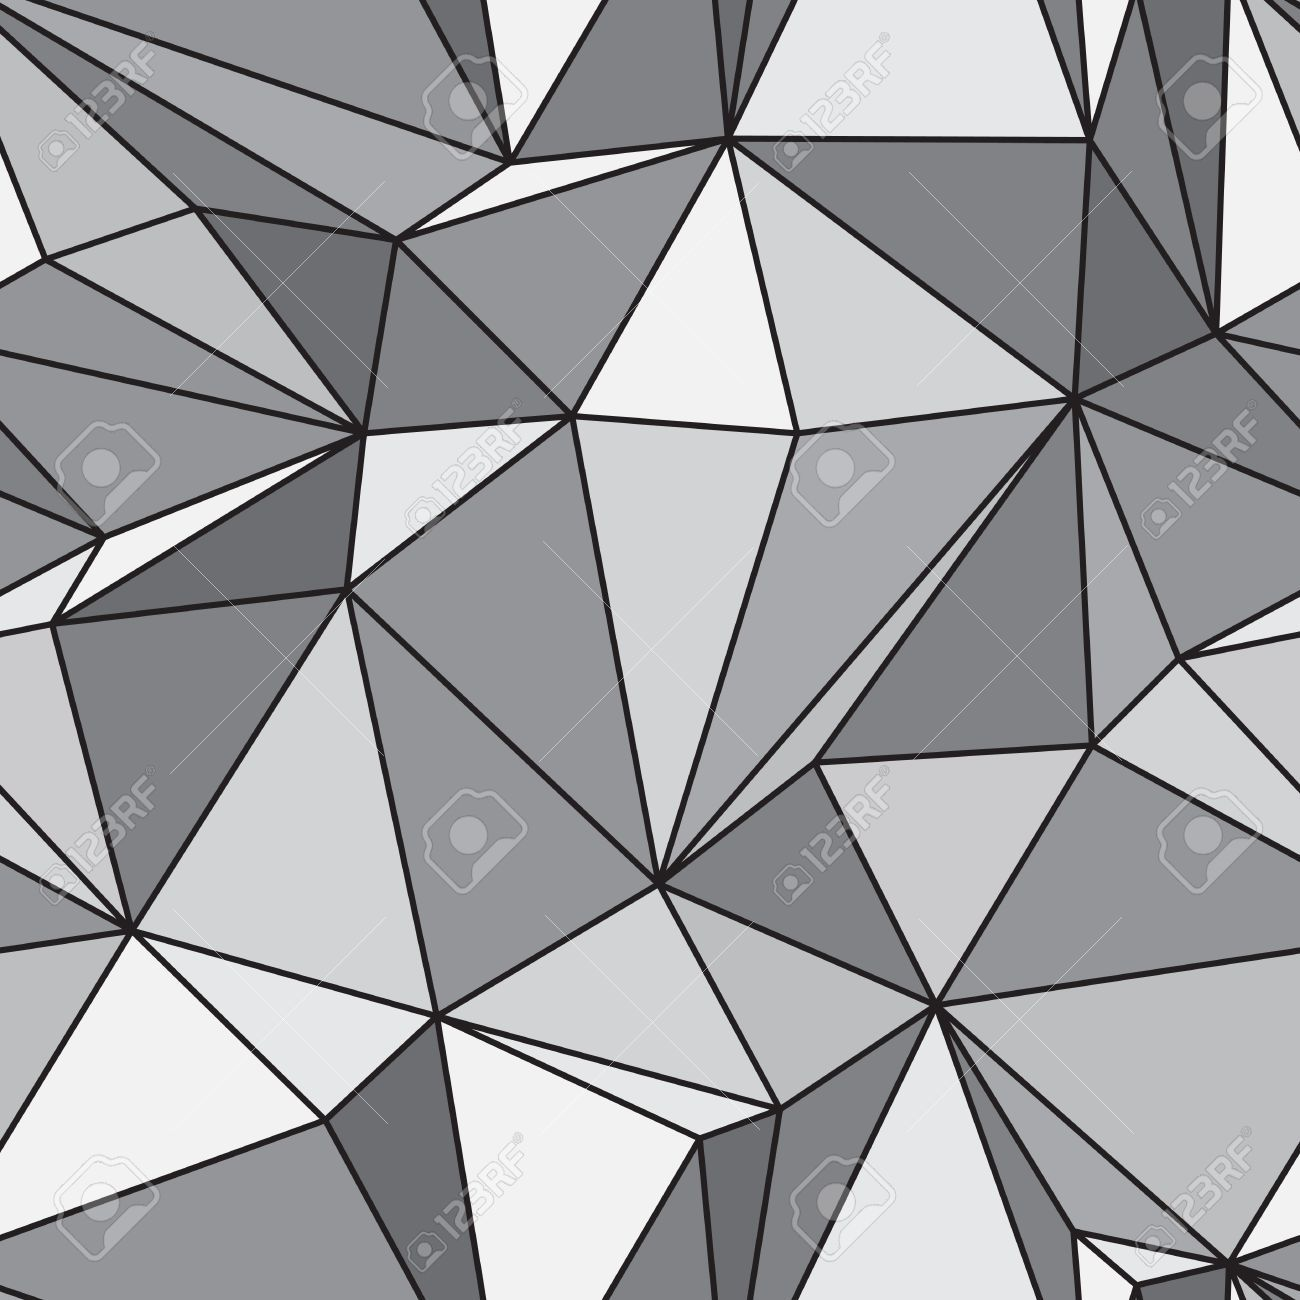 diamond geometric pattern - Google Search | ! Art/DIY ...